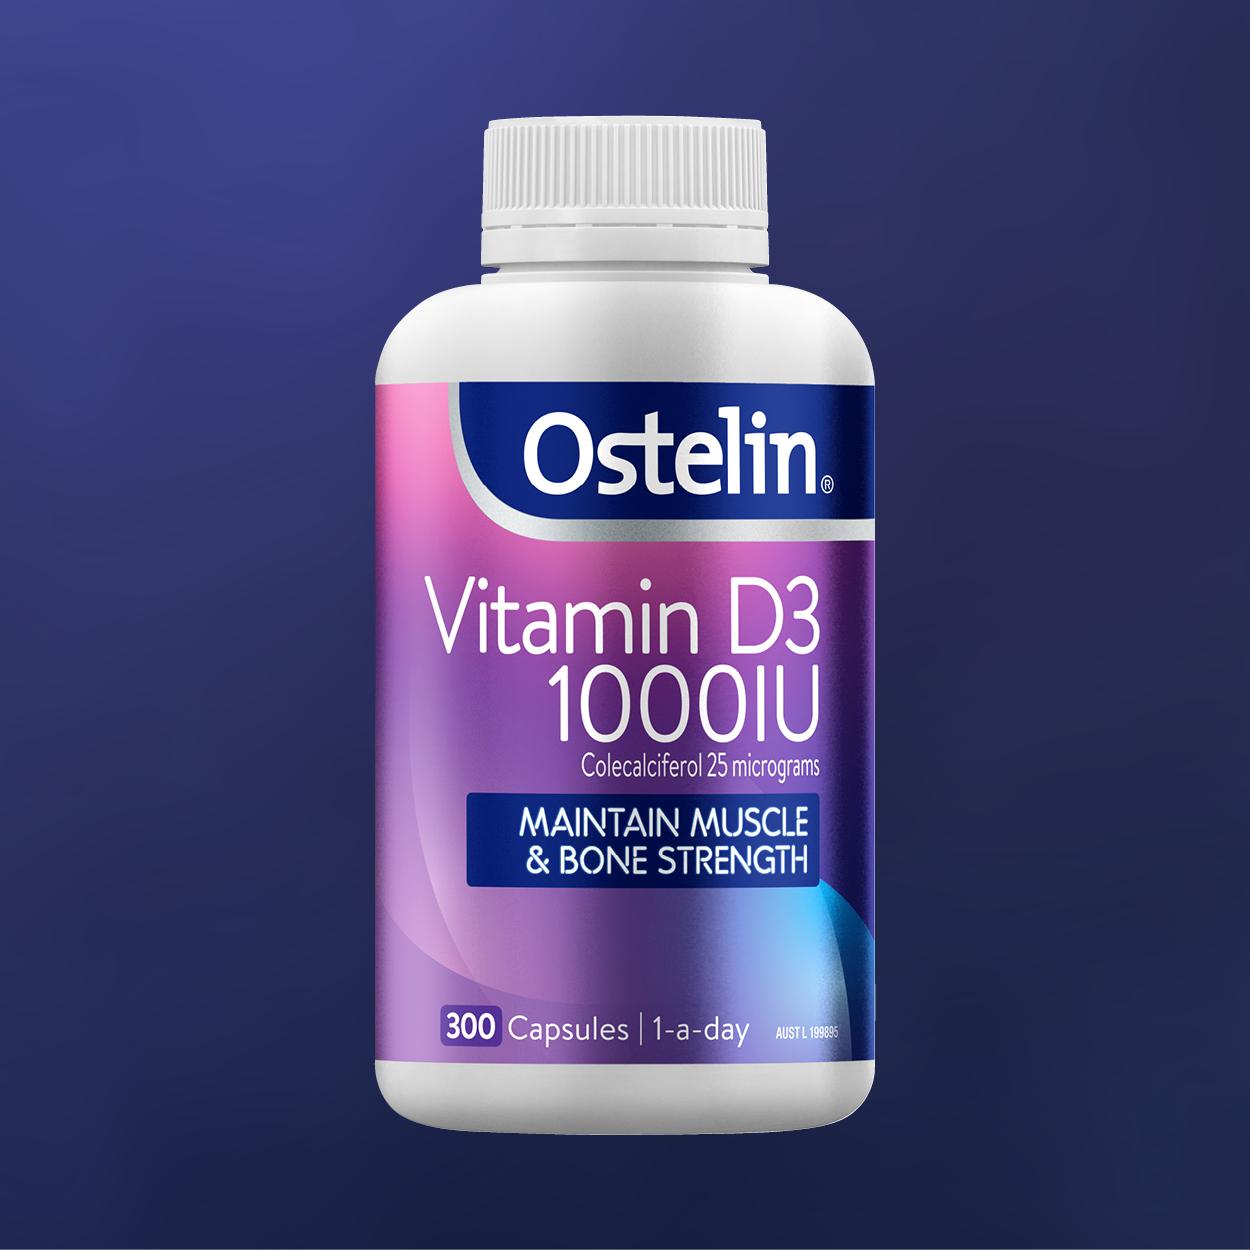 Ostelin Vitamin D3 1000IU Capsules 60 Pack